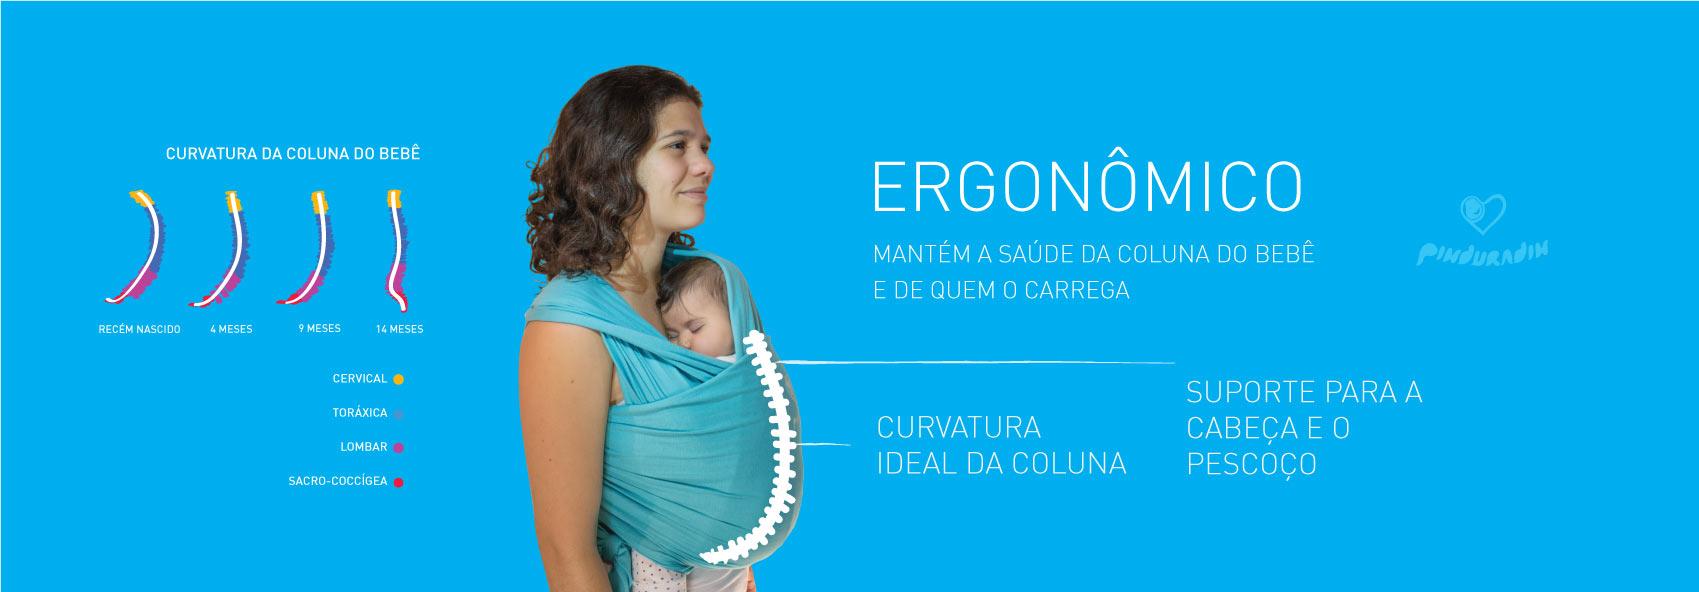 ergonomico.jpg